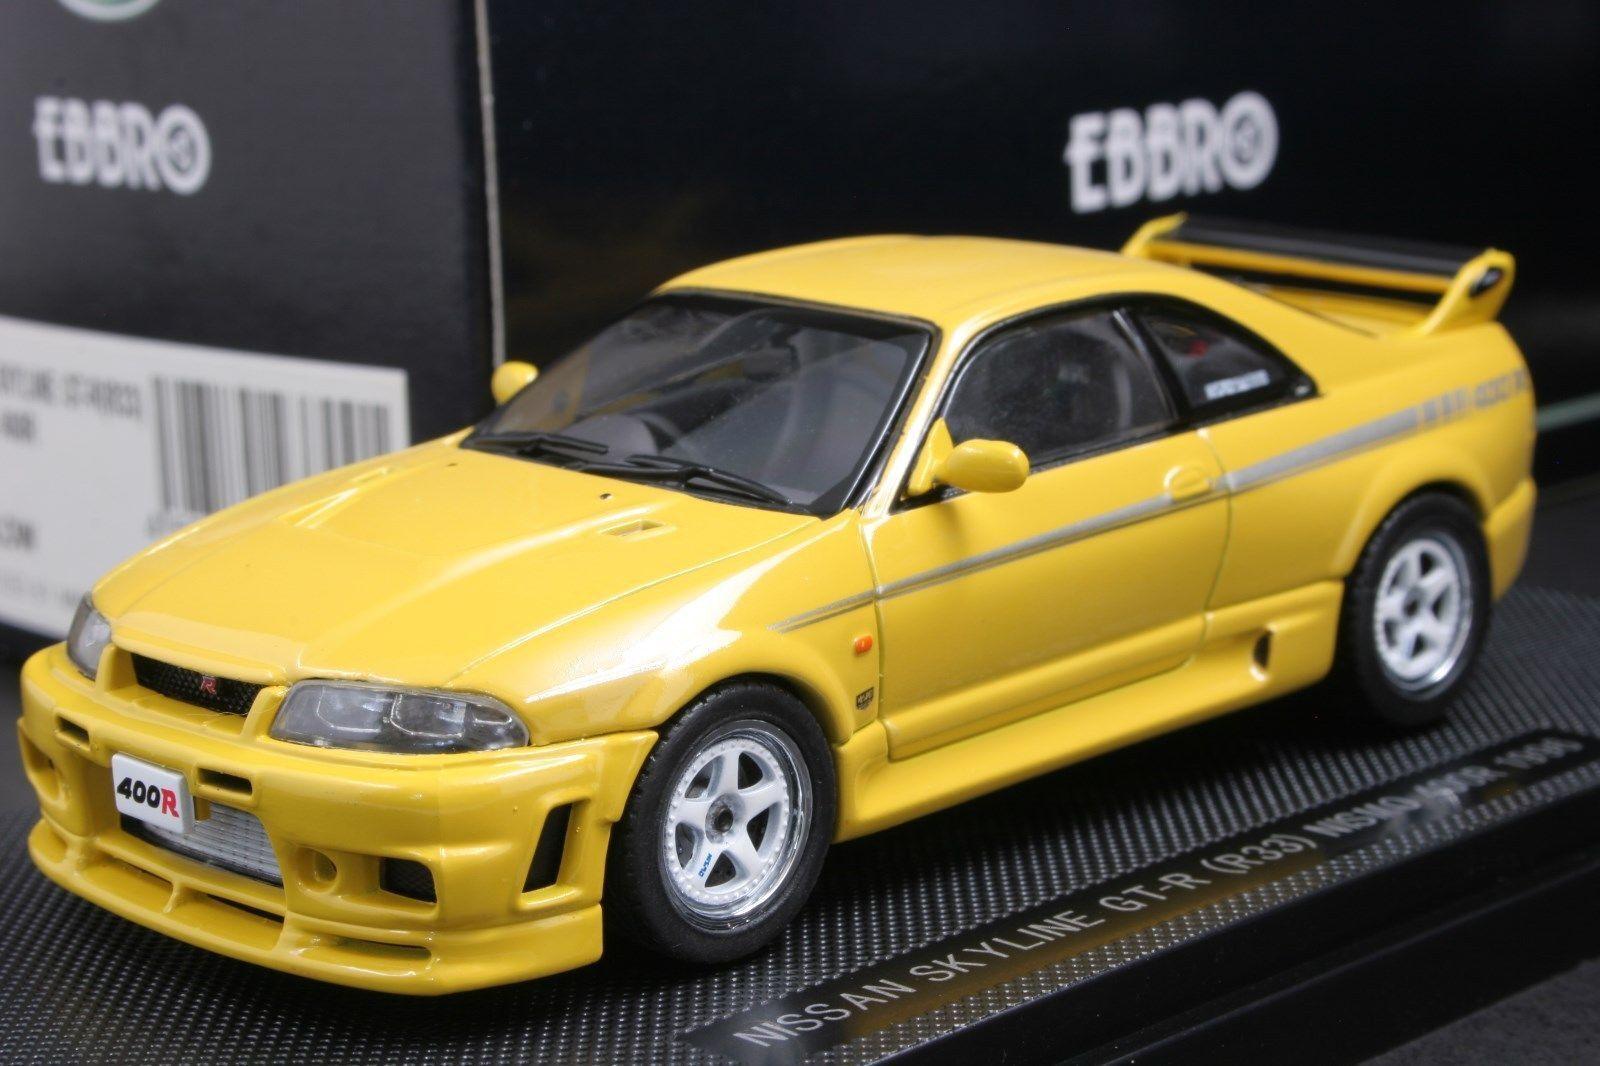 EBBRO 1 43 Scale Nissan Nismo Skyline GT-R R33 400R jaune Die cast voiture modèle